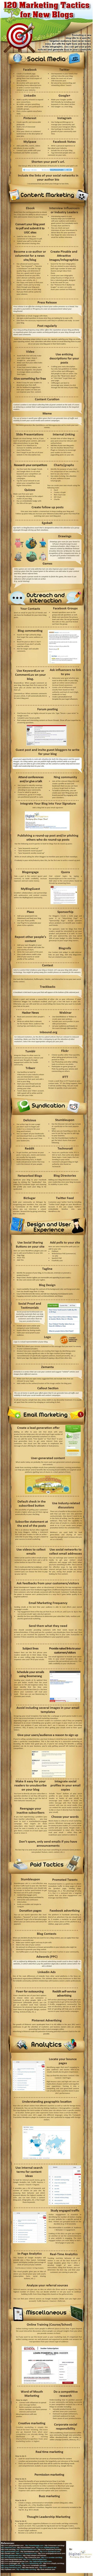 100+ Marketing Tactics for Blogging Success [#infographic] #Blogging #marketing by digitalphilippines